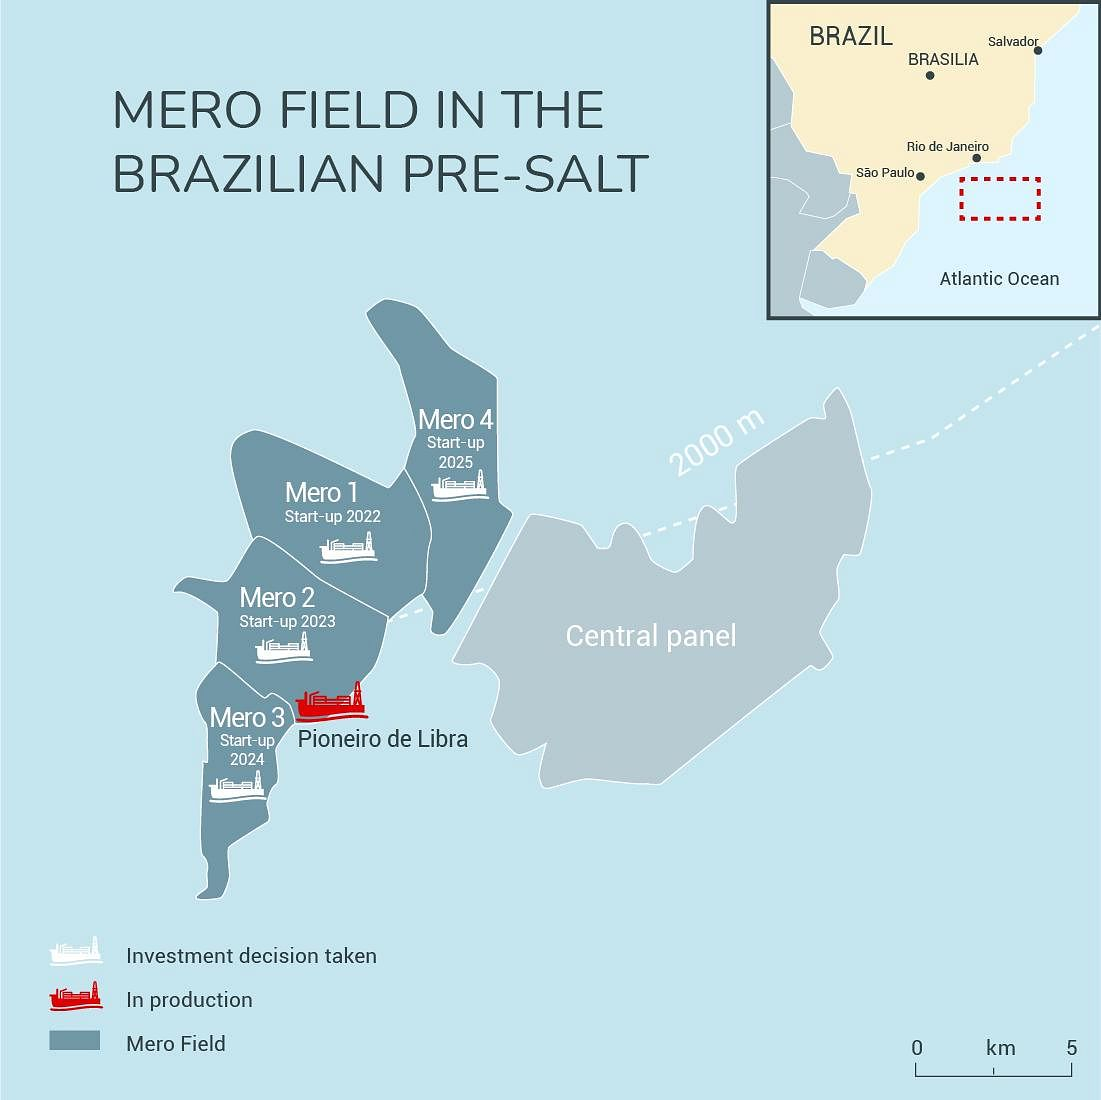 TotalEnergies Launches Phase 4 Mero Field Development